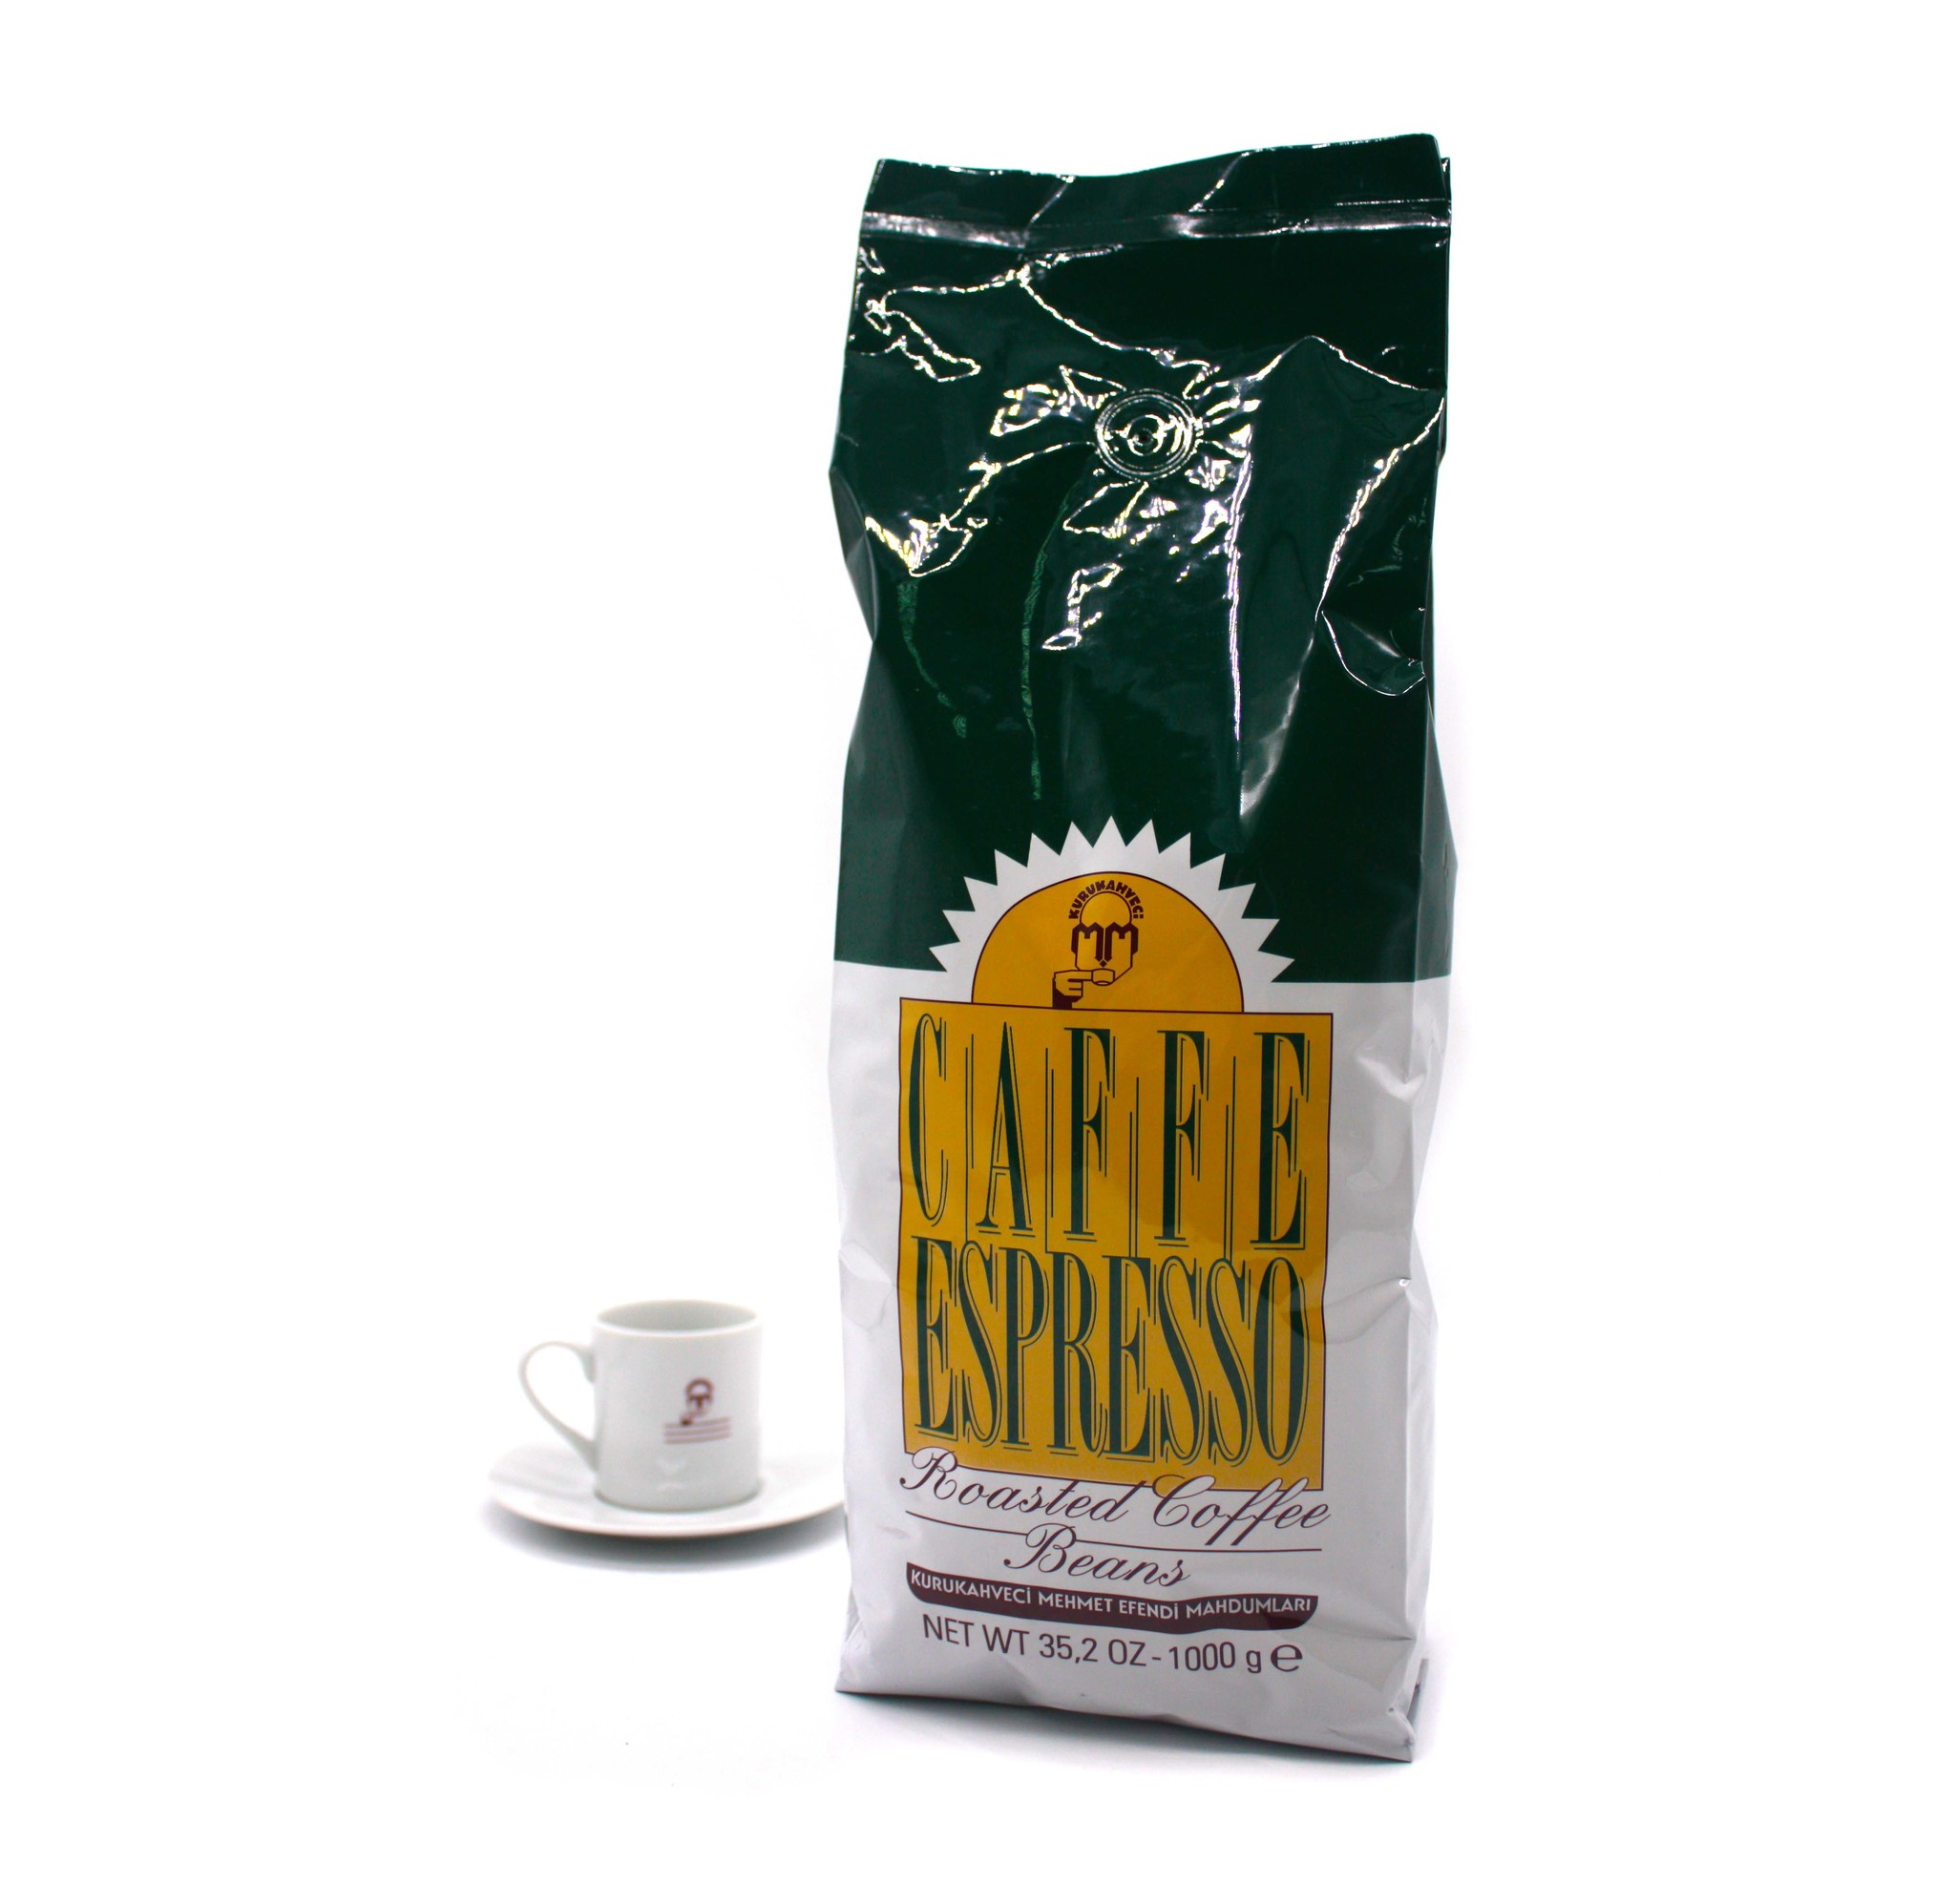 Mehmet Efendi Кофе в зернах Espresso, Mehmet Efendi, 1 кг import_files_02_021915ffbd9311e9a9b1484d7ecee297_02191605bd9311e9a9b1484d7ecee297.jpg